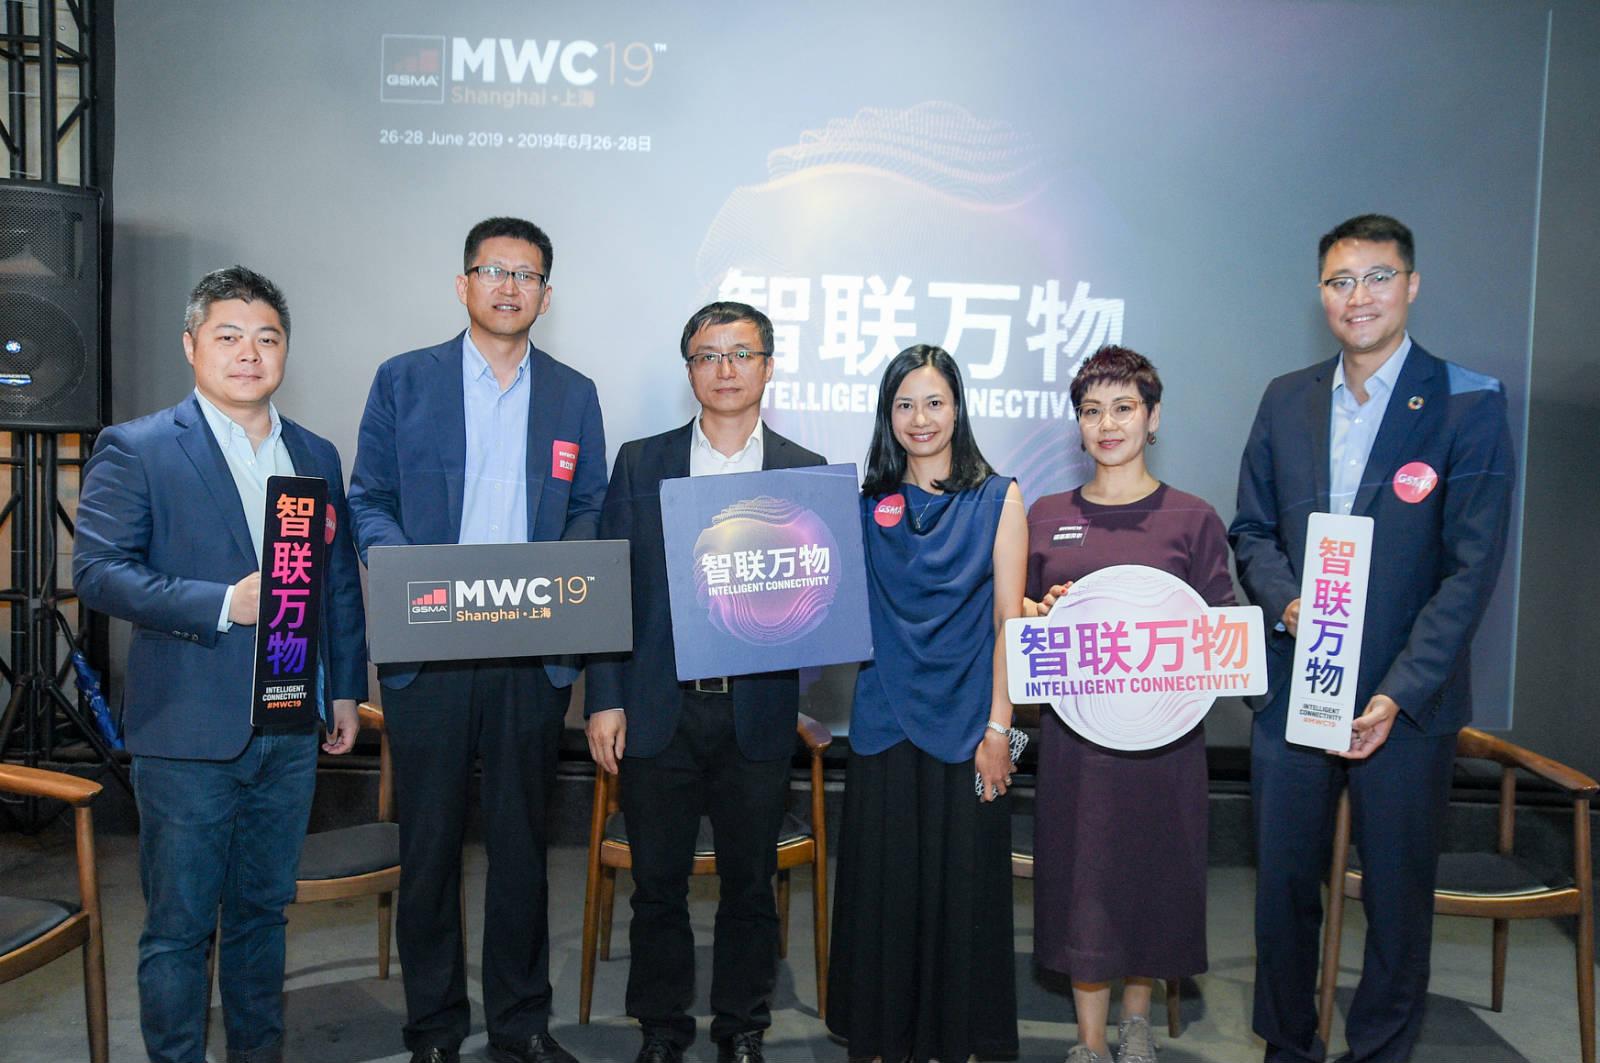 MWC19上海展|专家:中国引领5G创新需做到差异化